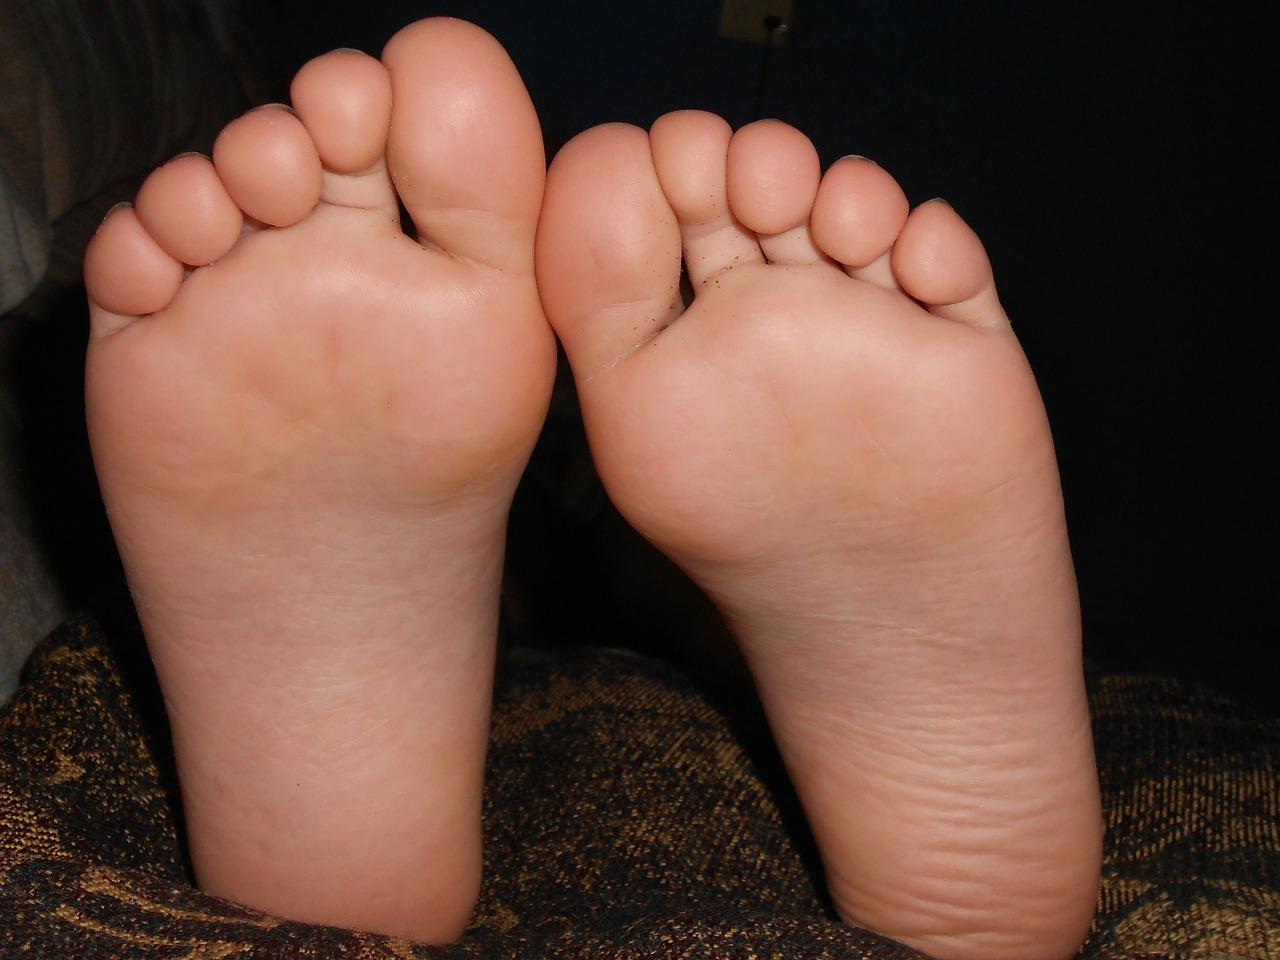 feet-179233_1280